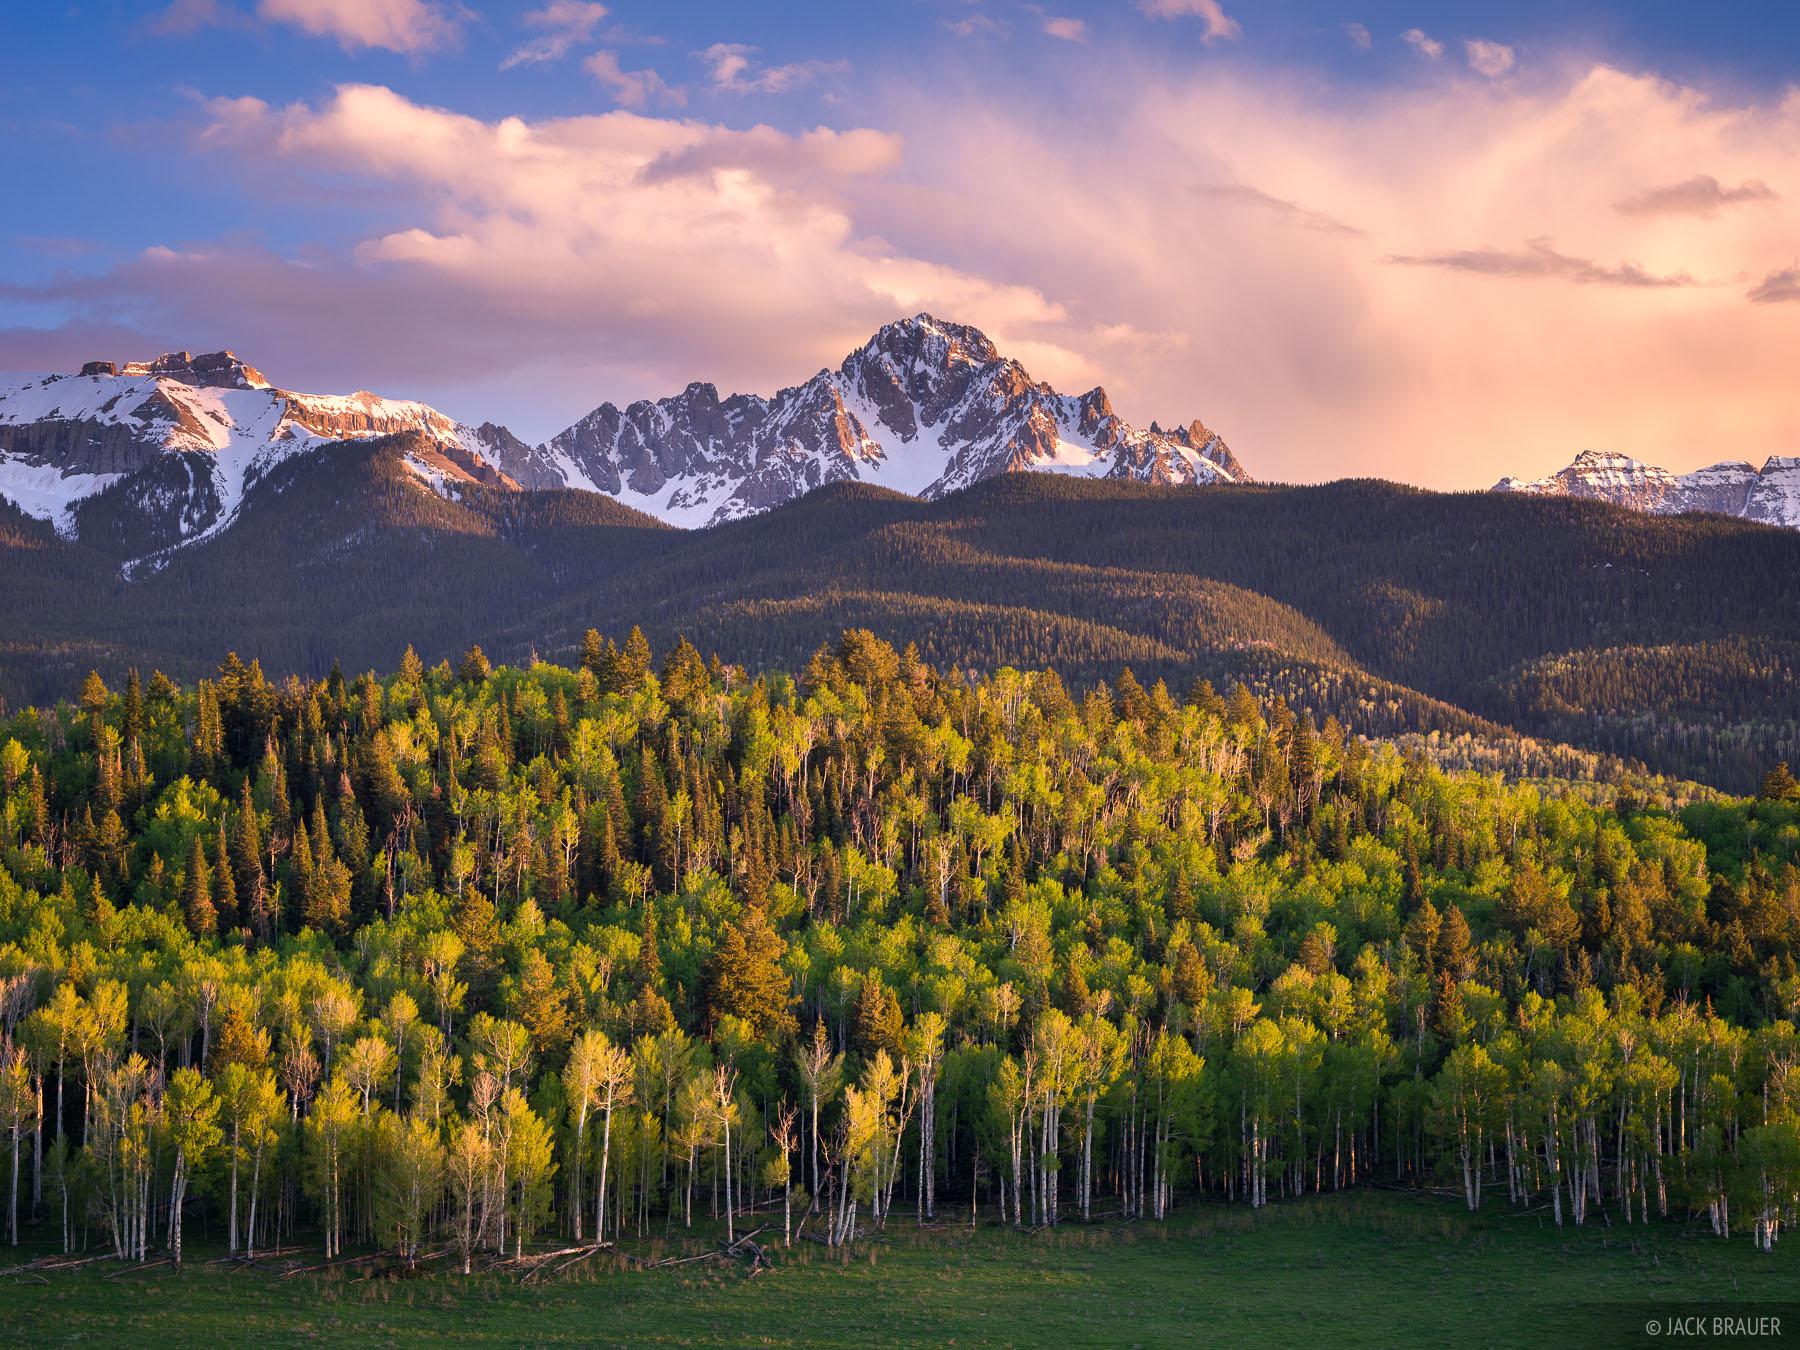 Mt. Sneffels and freshly budded aspens in the Sneffels Range, May.